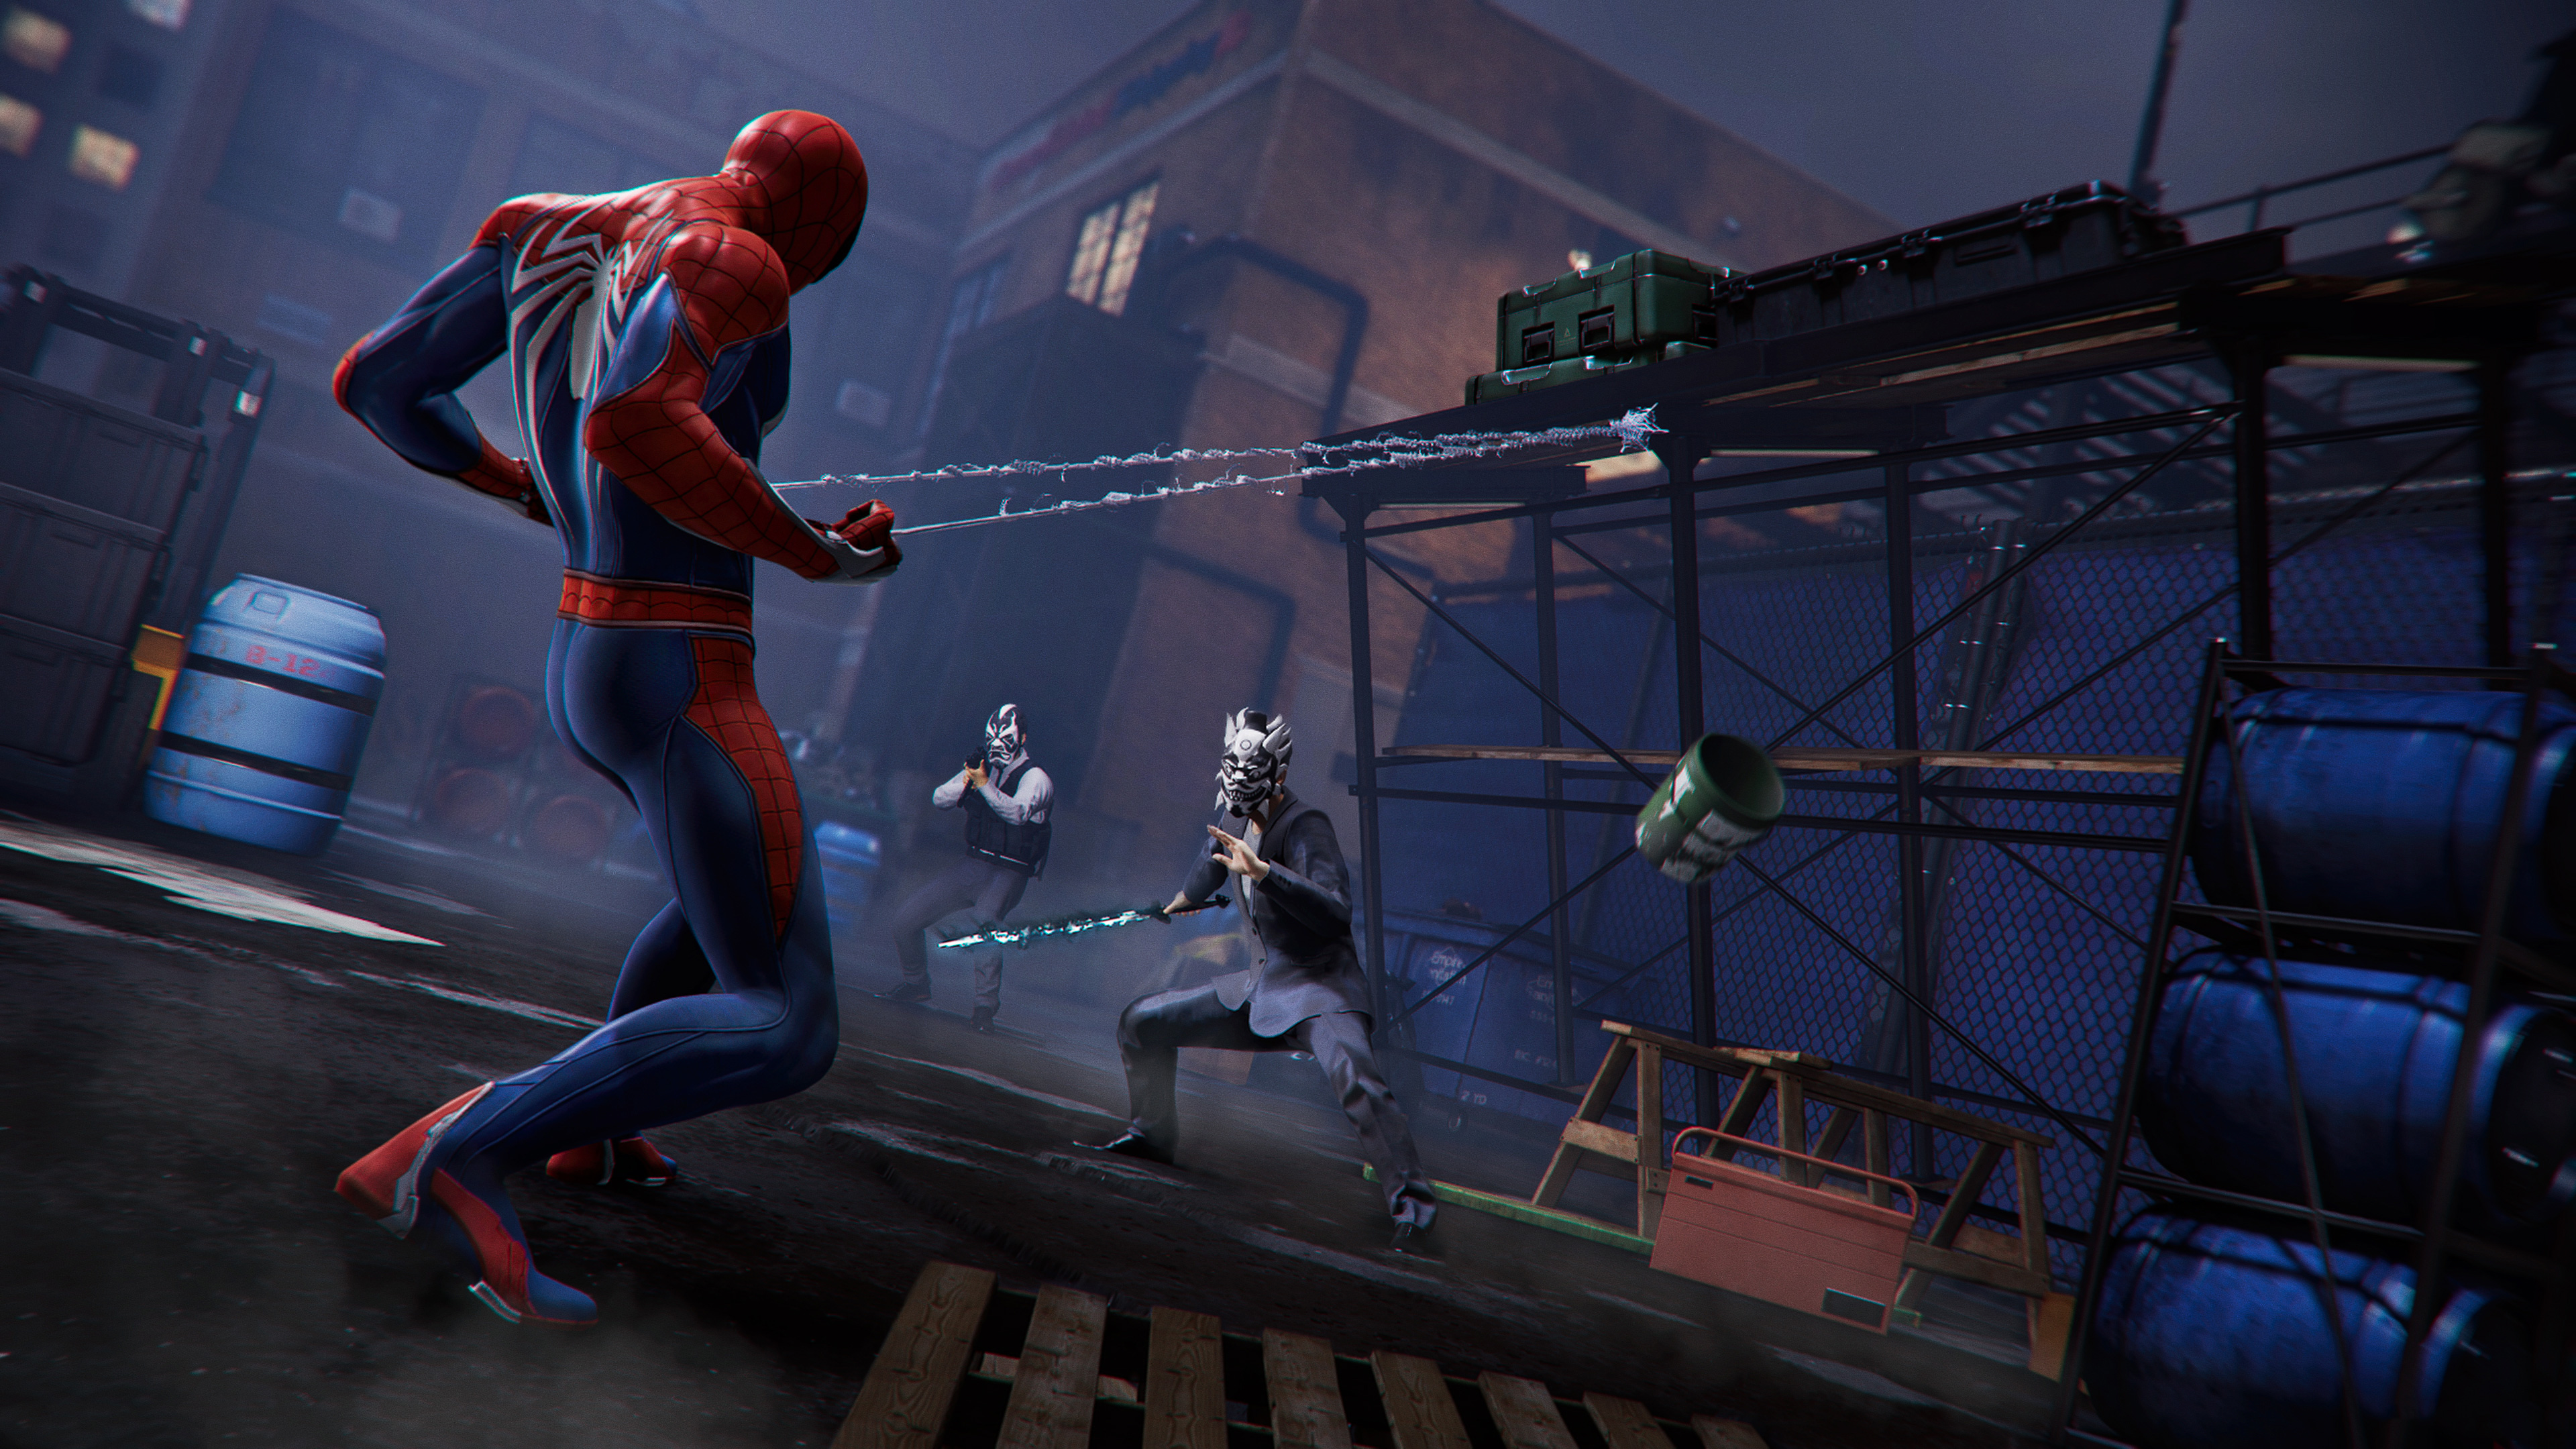 4k Gaming Wallpaper: Spiderman Ps4 Pro Gaming 4k, HD Games, 4k Wallpapers